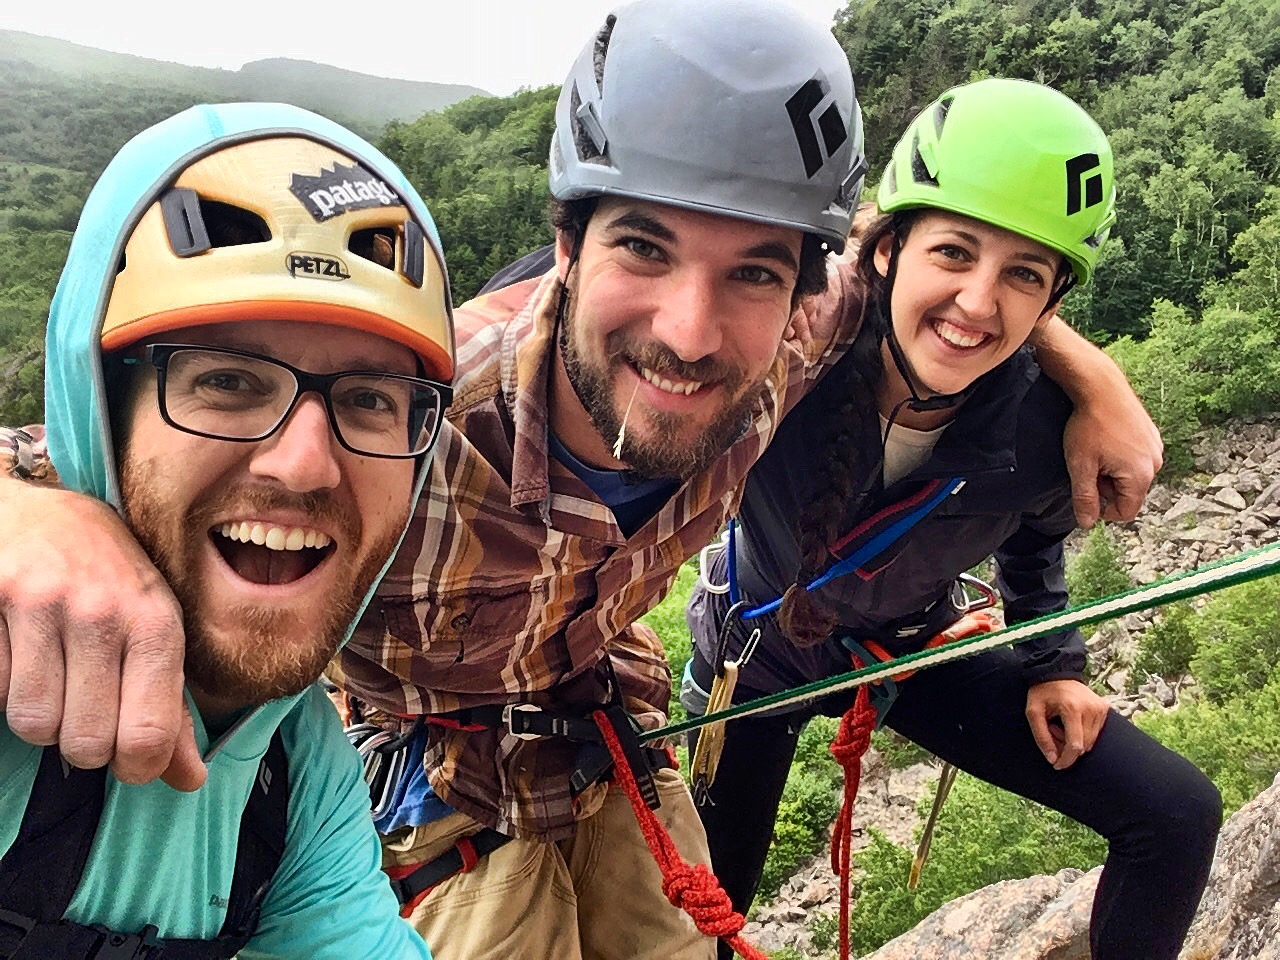 Noah Kleiner John Sidik and Lauren Cote Rock Climbing